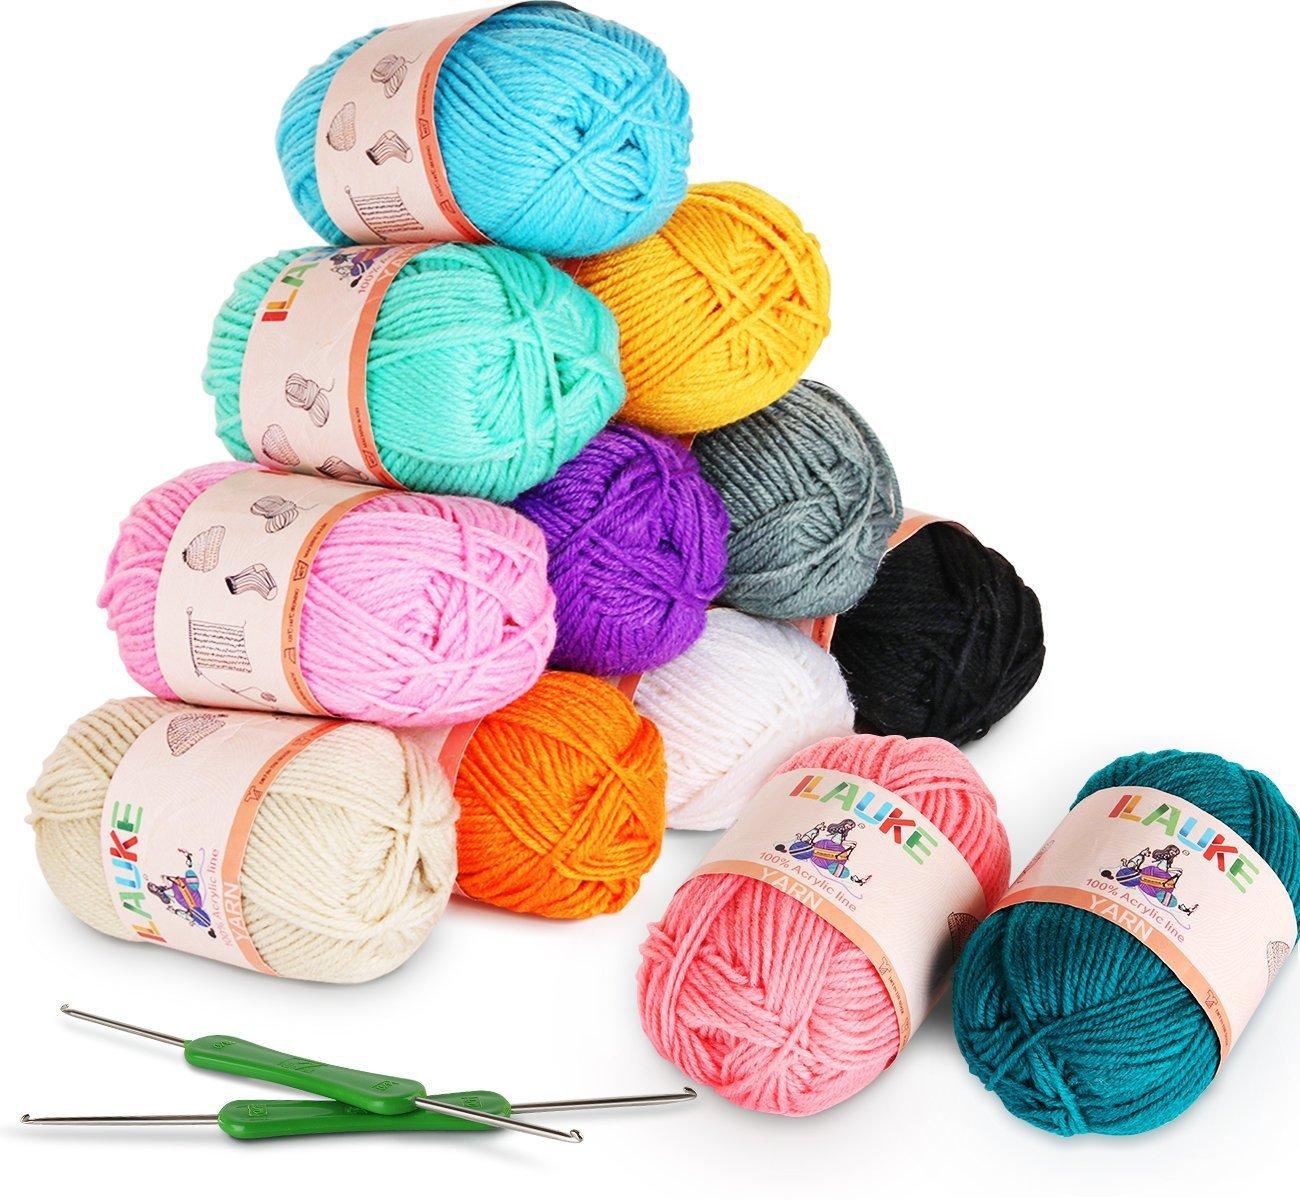 ilauke 12 Acrylic Yarn Skeins Assorted Colors Bonbons 100% Acrylic Soft Yarn for Kids Knitting Crochet & Crafts (50G X 12)